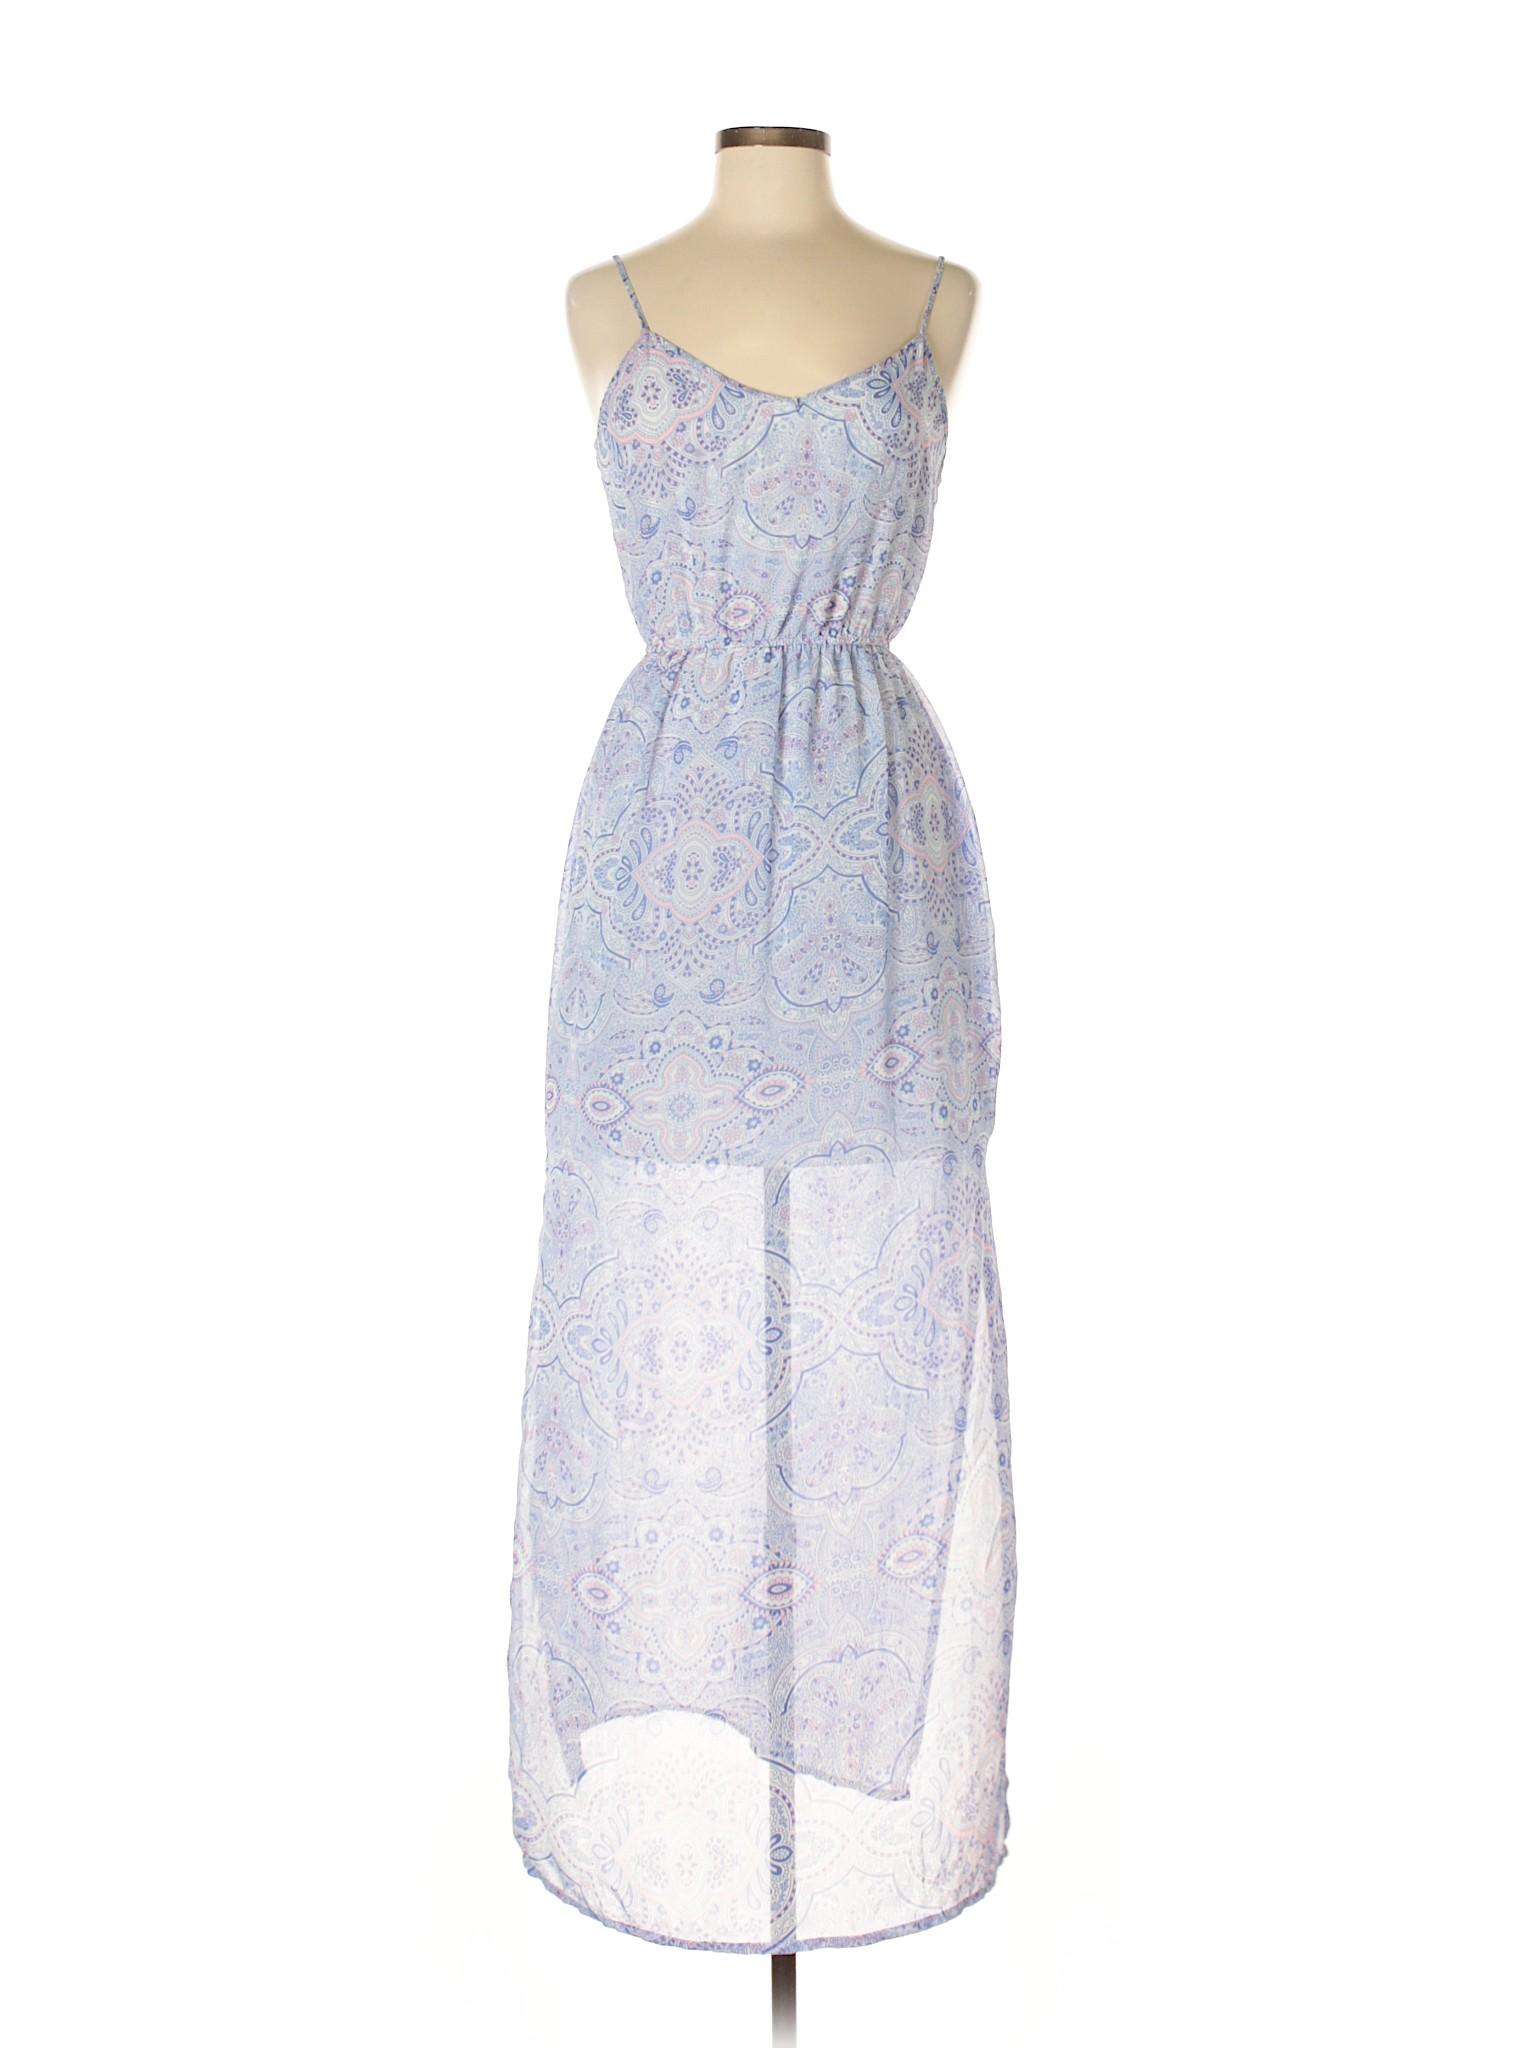 Selling Dress Casual Dress Cotton Cotton Selling Selling Dress Cotton On Casual On On Casual Selling xq5CYHW1w